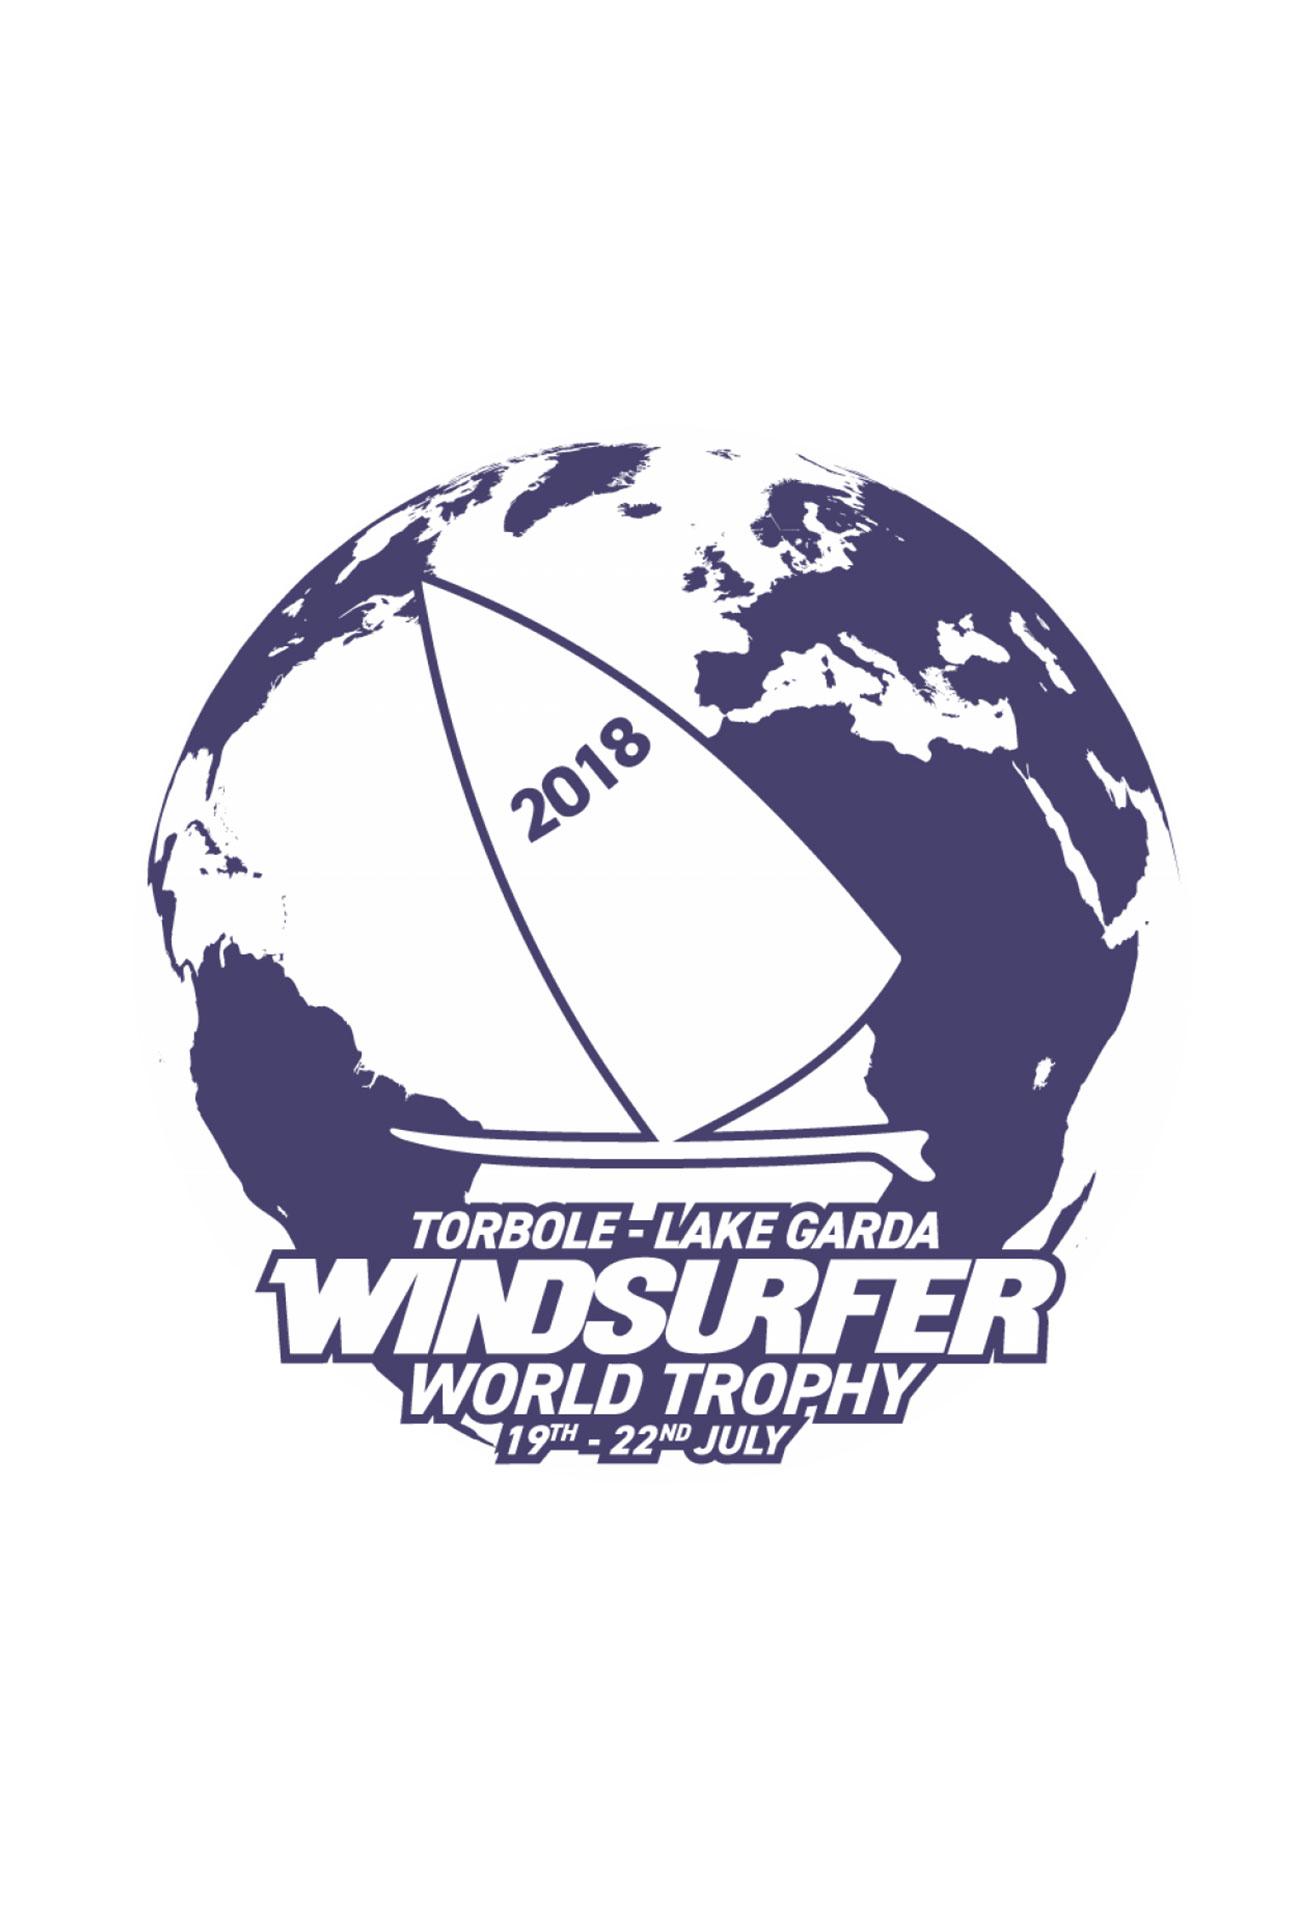 wsworldtrophy2018_p-elenagiolai-windsurferclass-cstorbole